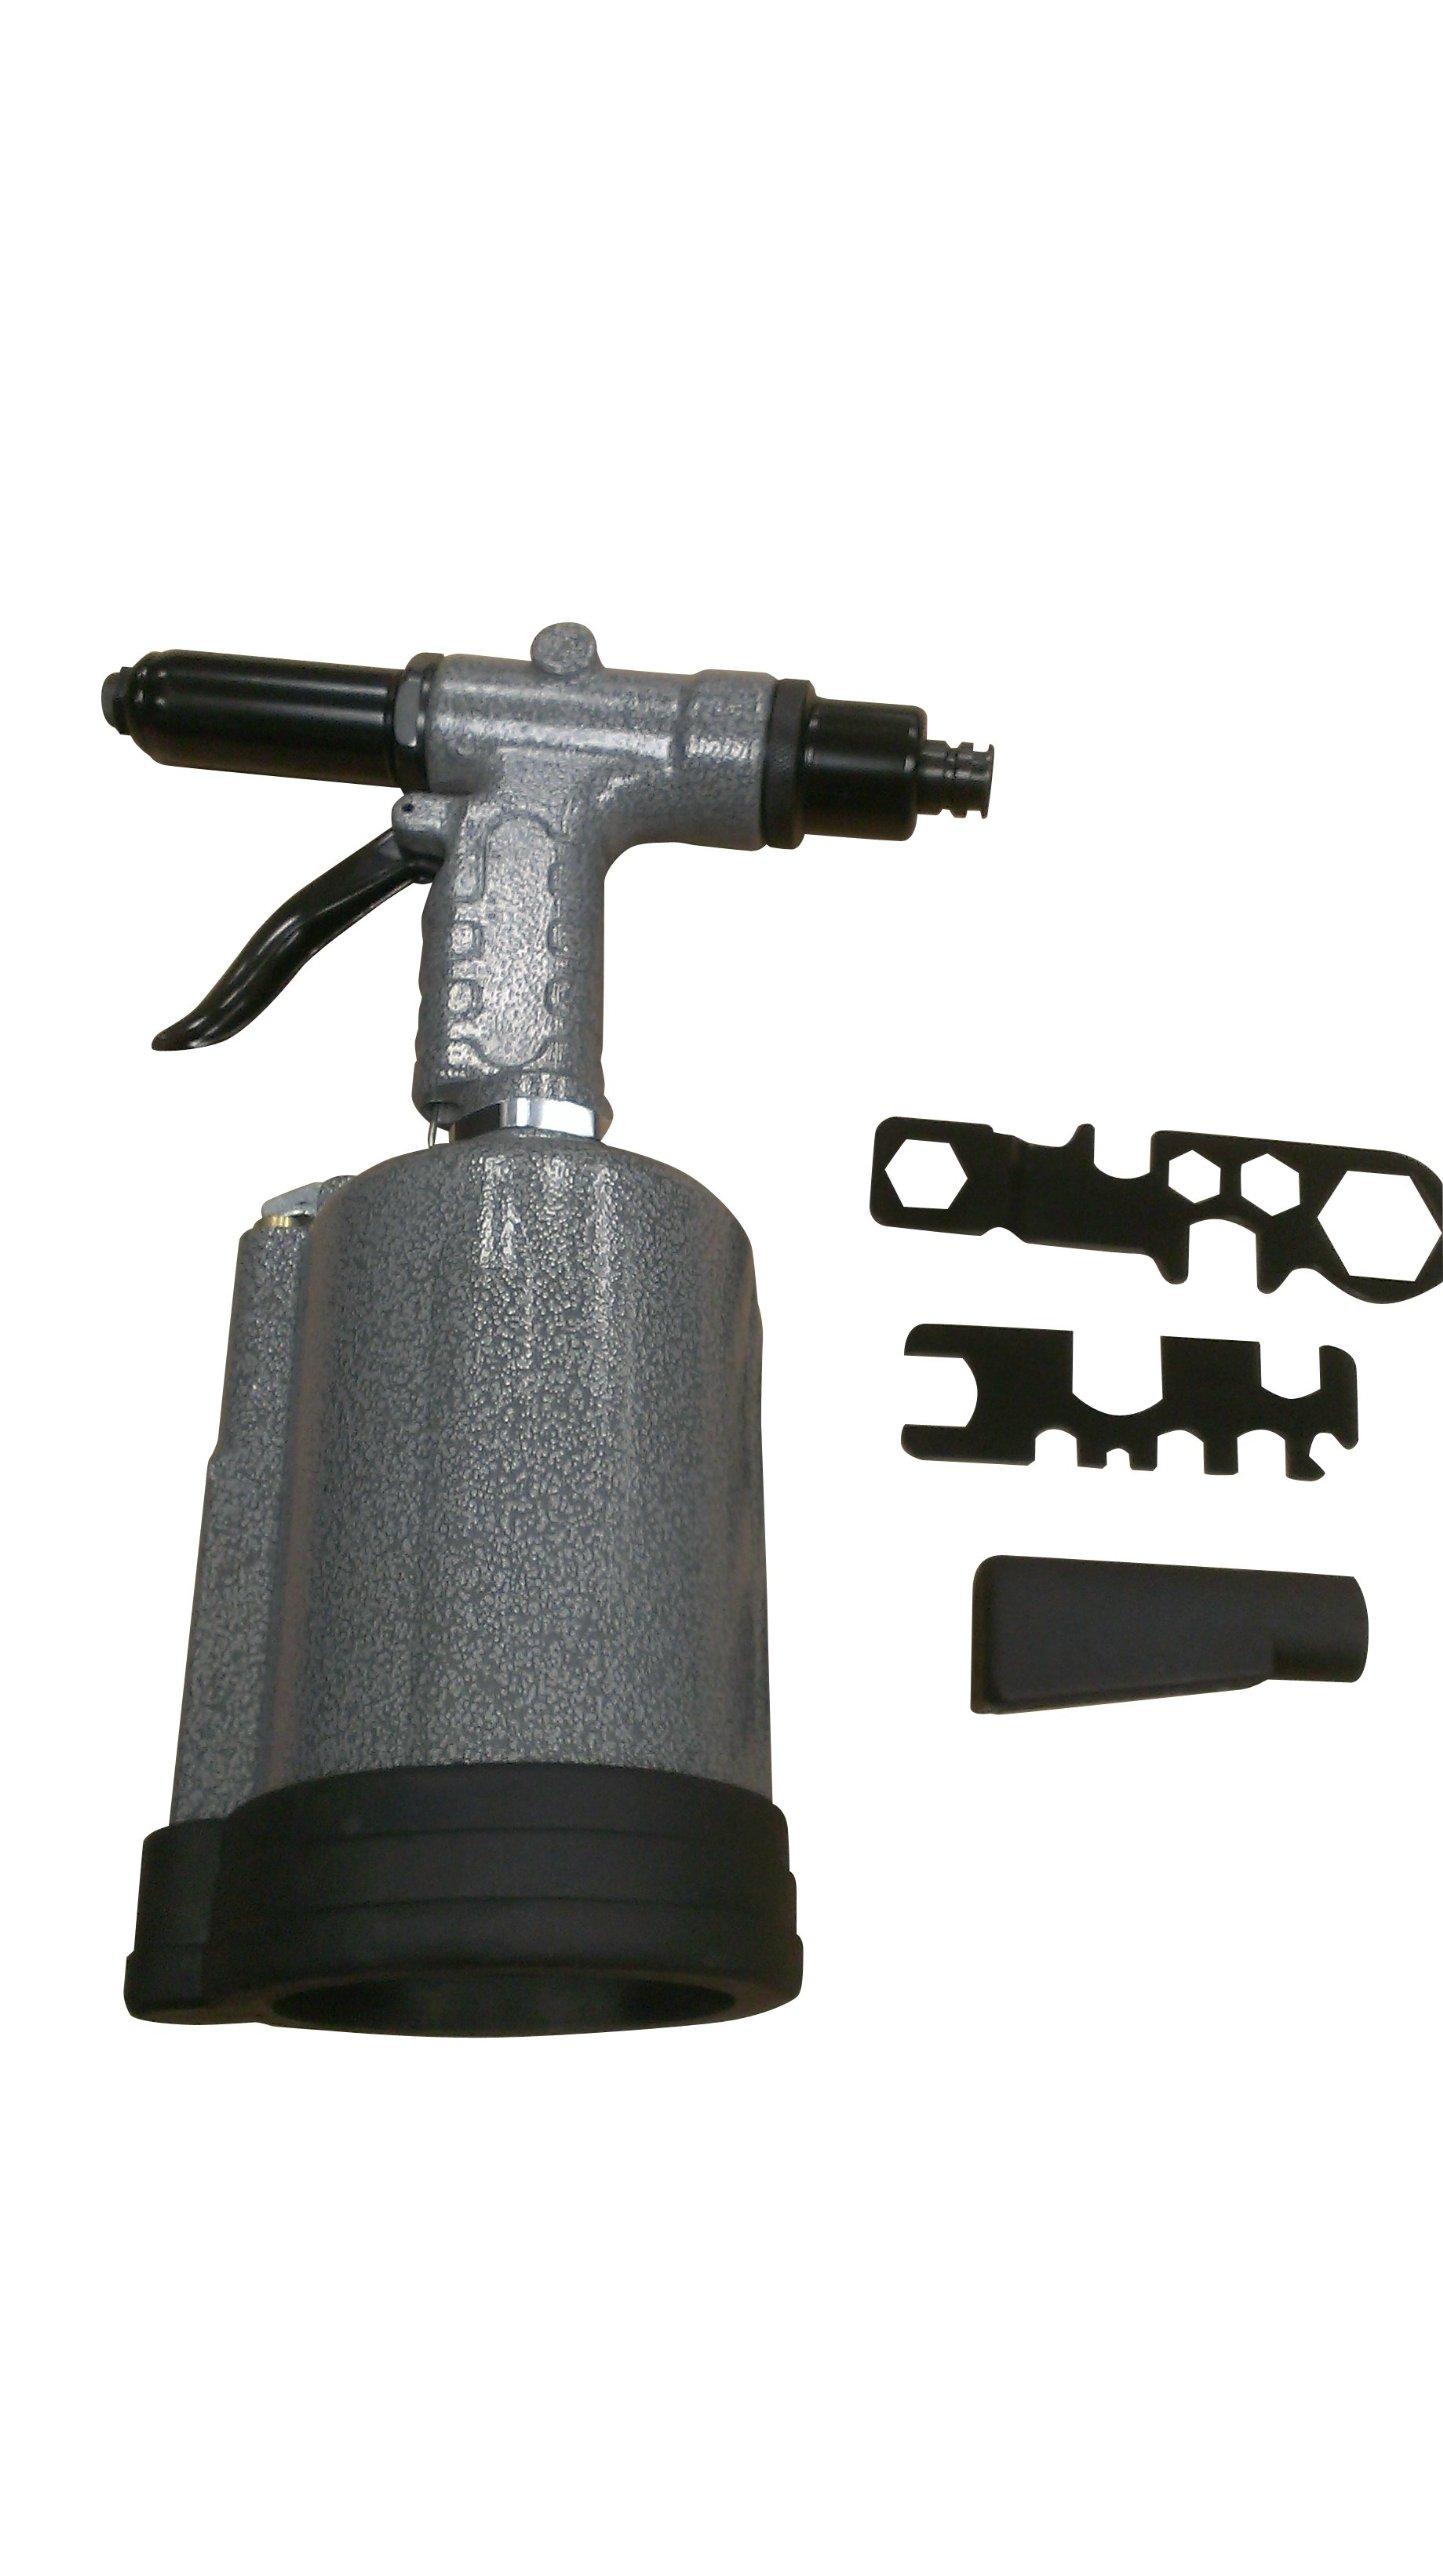 "SX1819T Sunex 3/16"" & ¼"" Heavy Duty Rivet Gun, 3960 lbF, 90PSI by Sunex Tools (Image #2)"